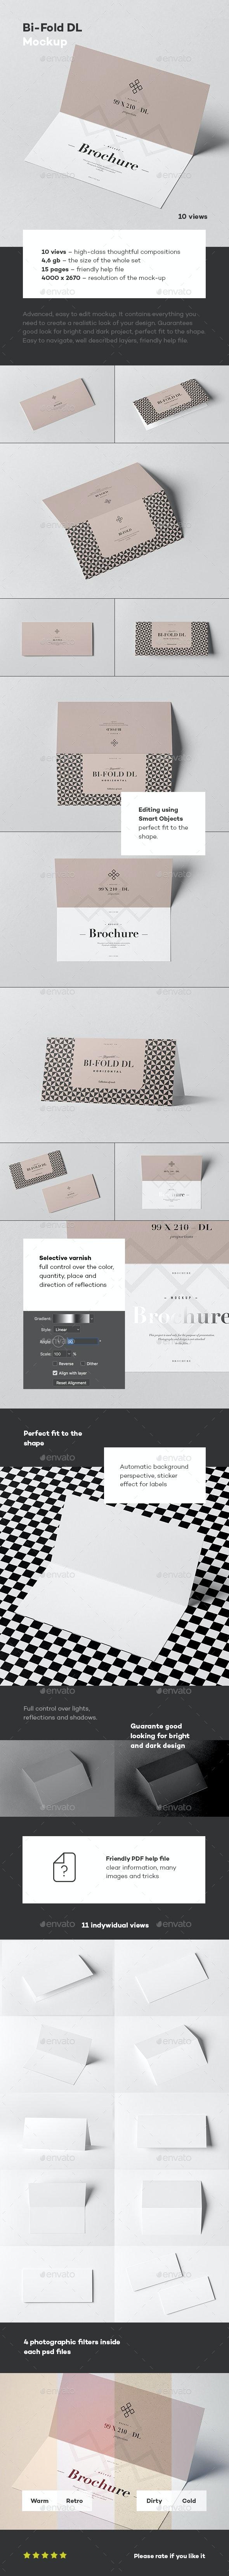 Bi-Fold DL Horizontal Brochure - Brochures Print